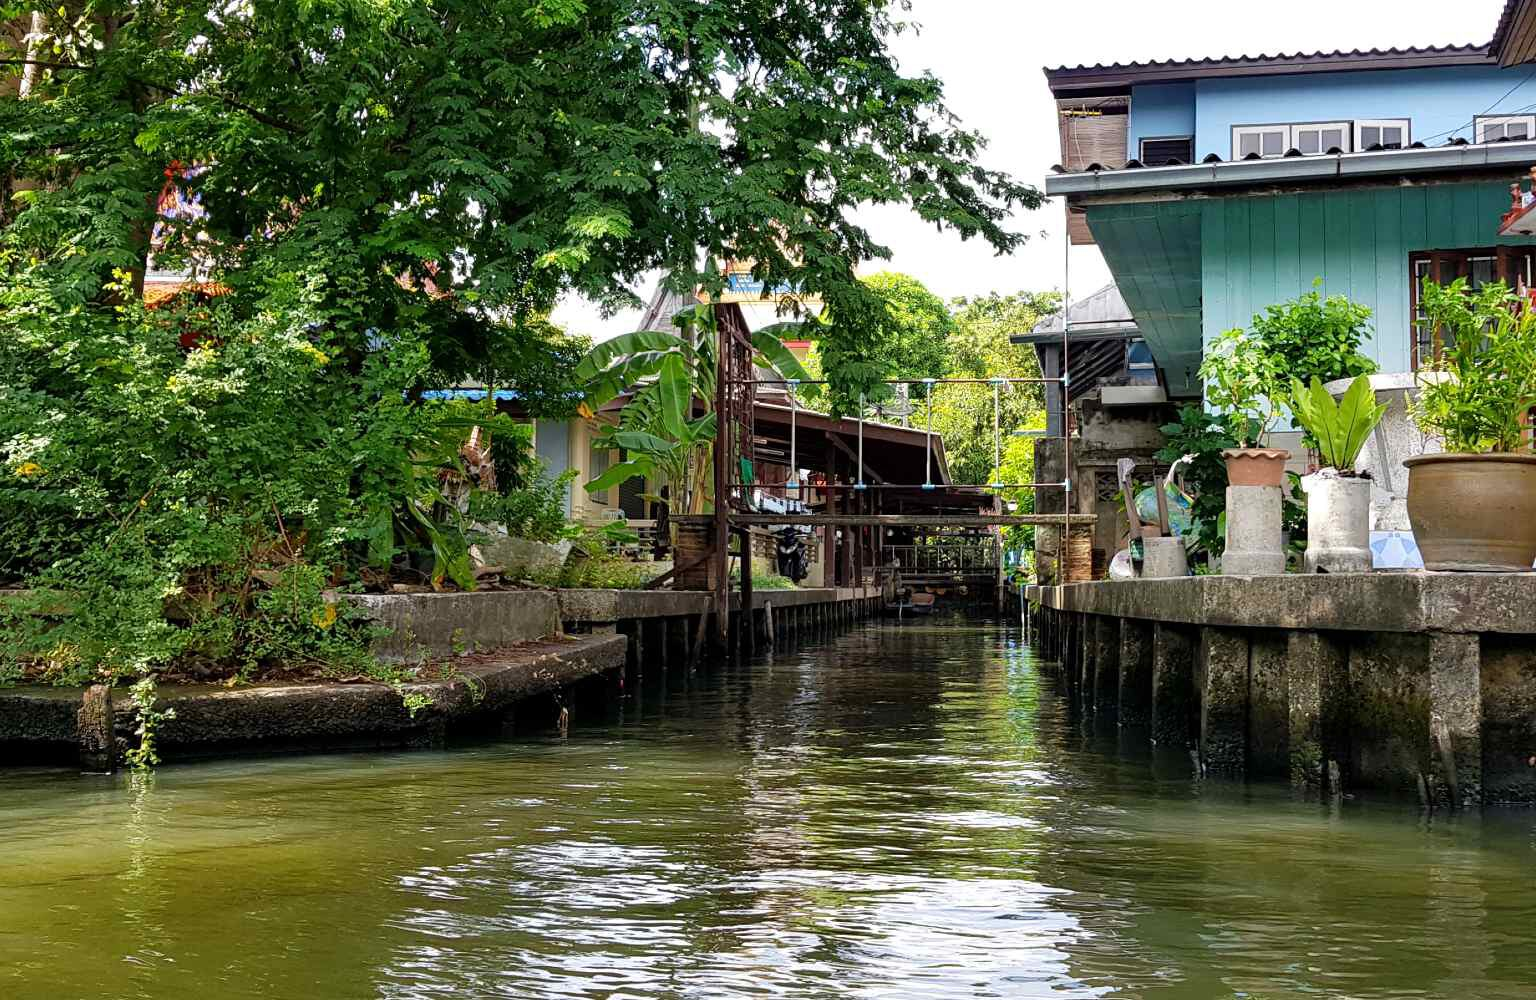 Smal kanaal in Bangkok